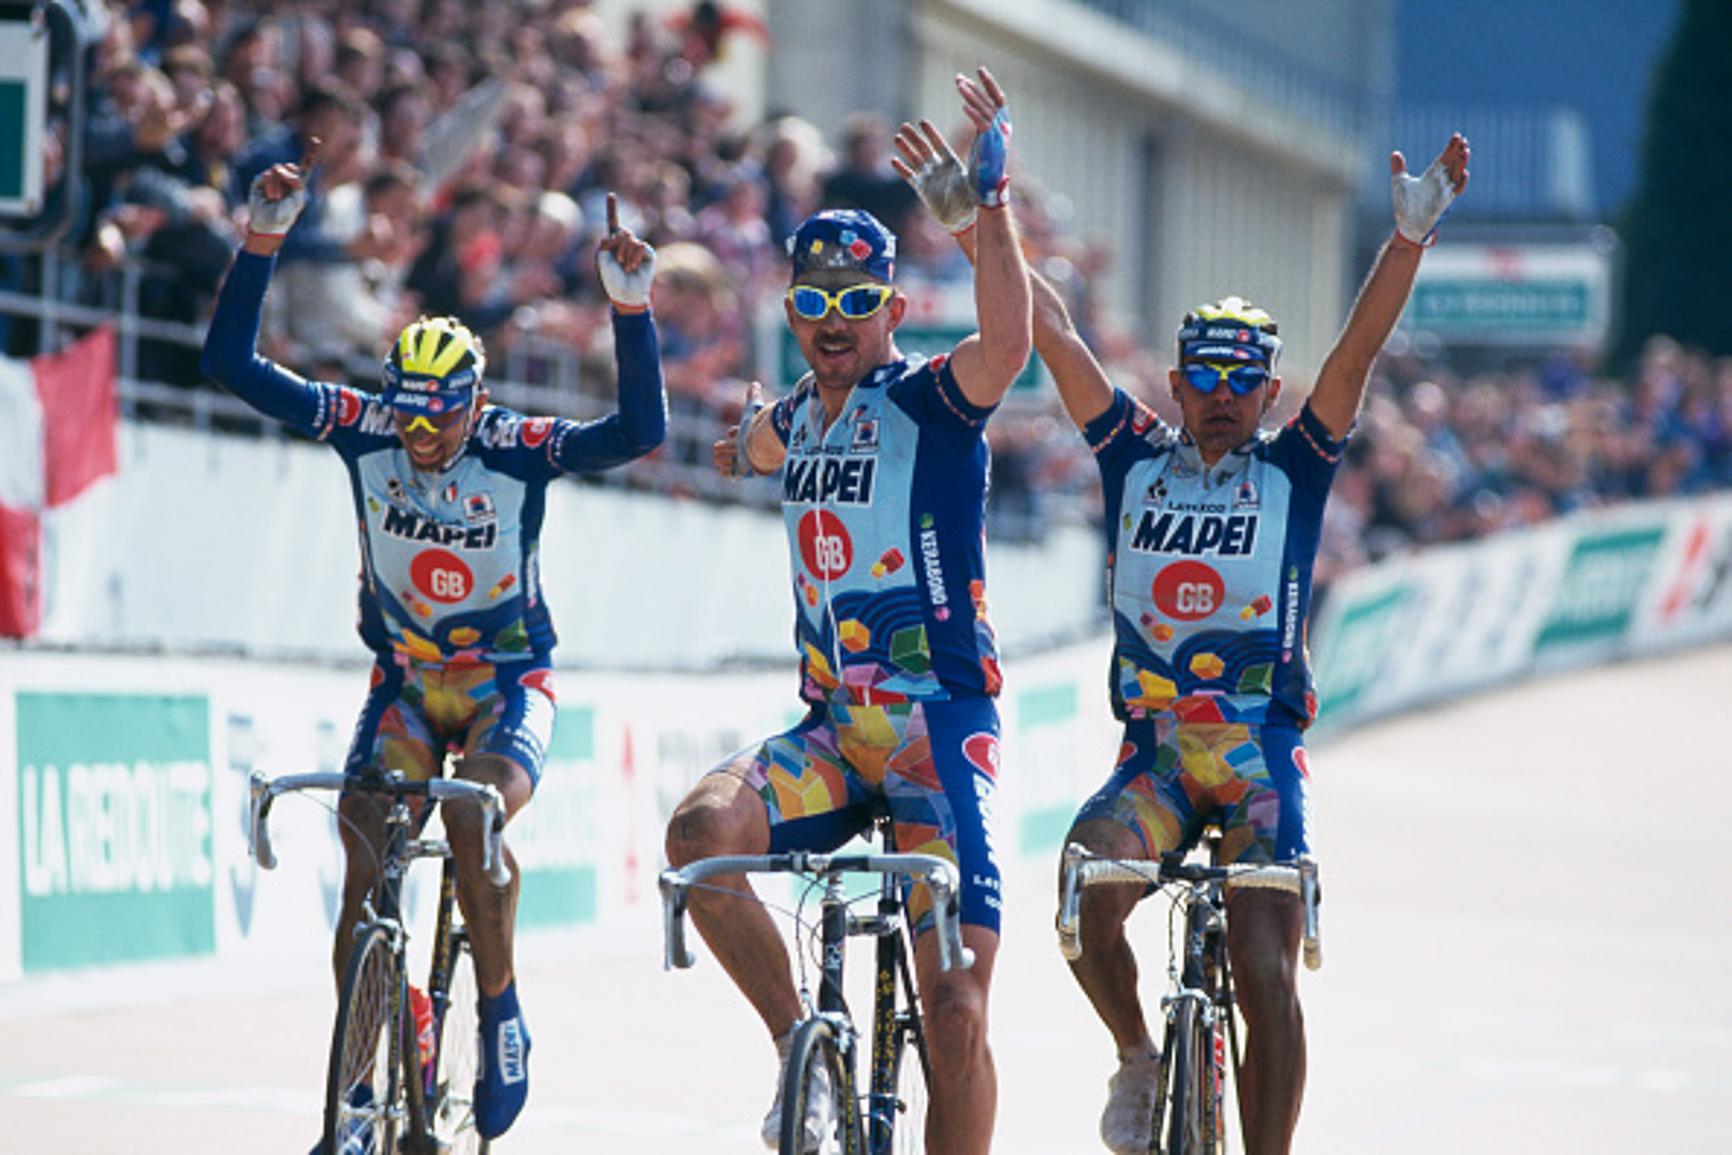 The legendary 1996 Paris-Roubaix with Mapei sweeping the podium: (l-r) Andrea Tafi (Italy),Johan Museeuw (Belgium),Gianluca Bortolami (Italy)